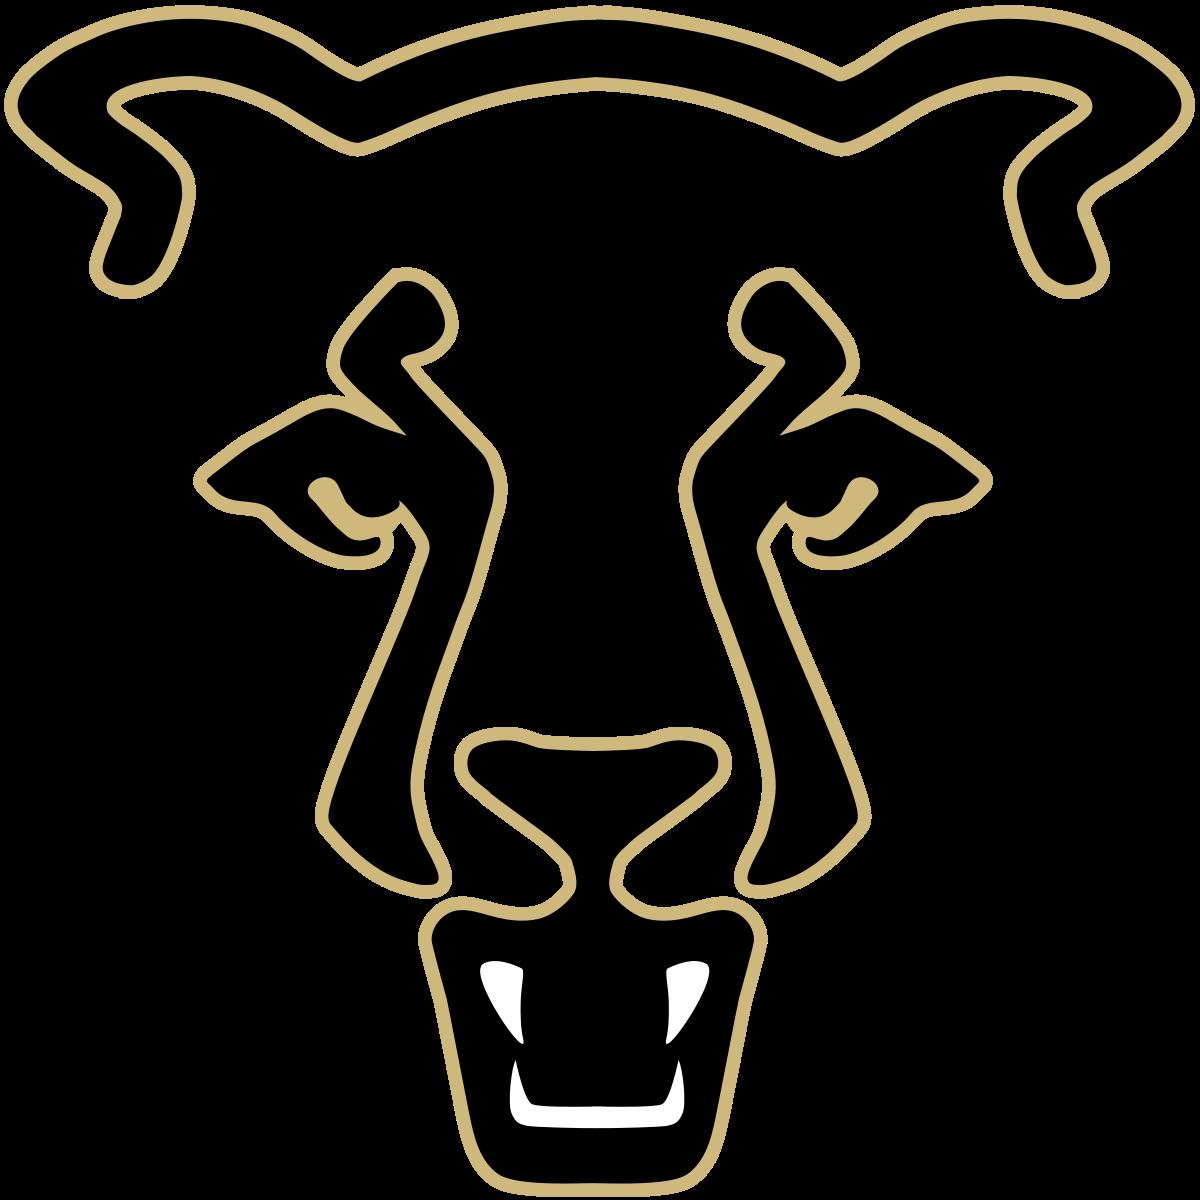 University of Colorado Colorado Springs Mountain Lion.